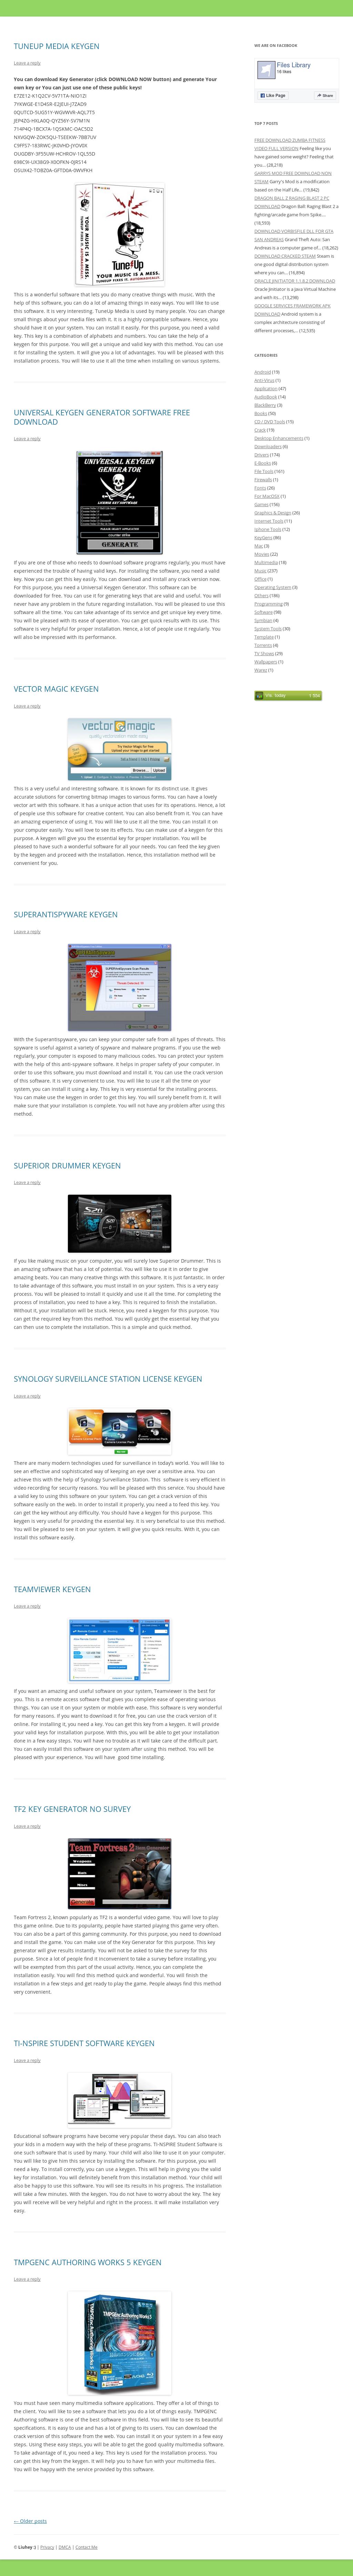 Owler Reports - Liuhey Blog SYNOLOGY SURVEILLANCE STATION